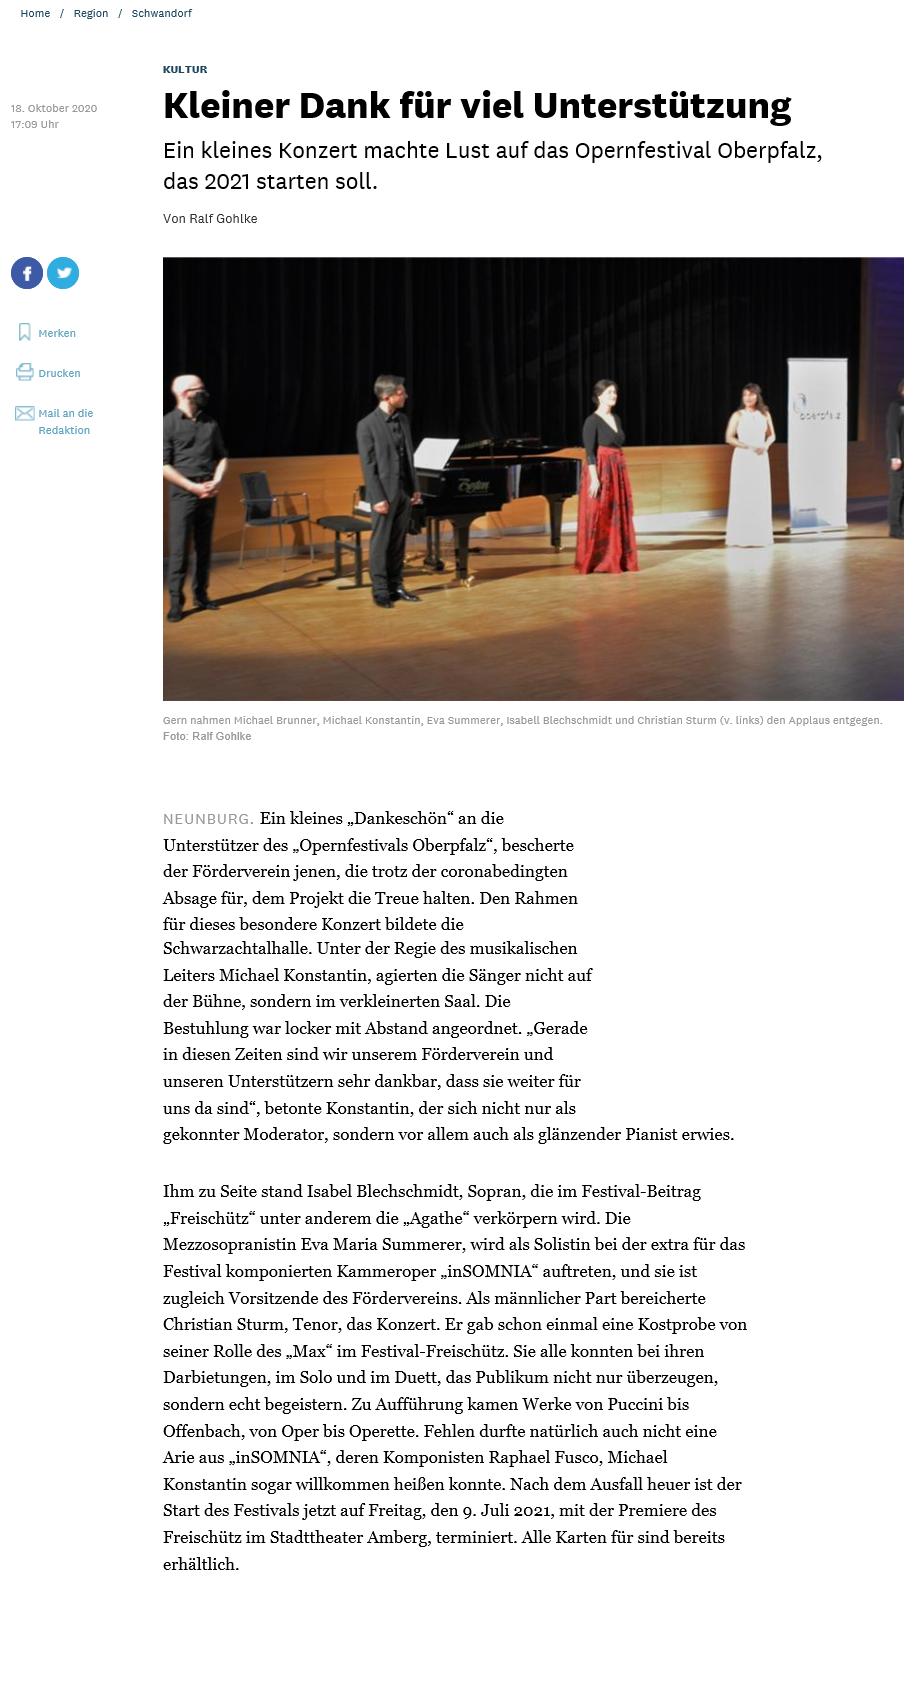 Opernfestival Oberpfalz - Musikalischer Dank an Förderer_MZ_vom_20201018